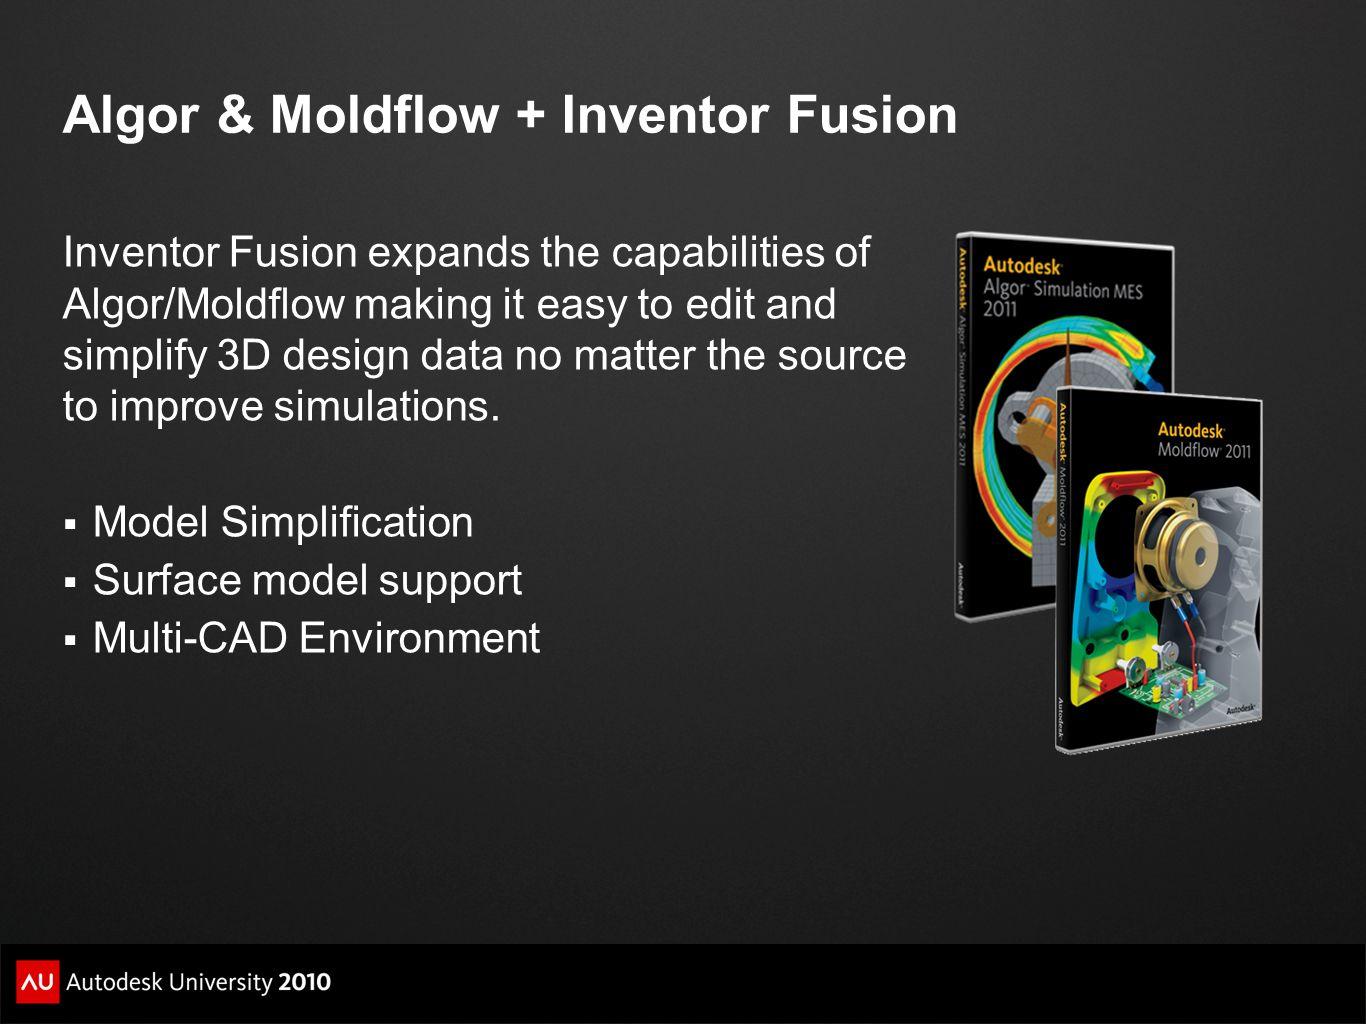 MA120-2R: Using Autodesk® Inventor® Fusion Kevin Schneider Senior